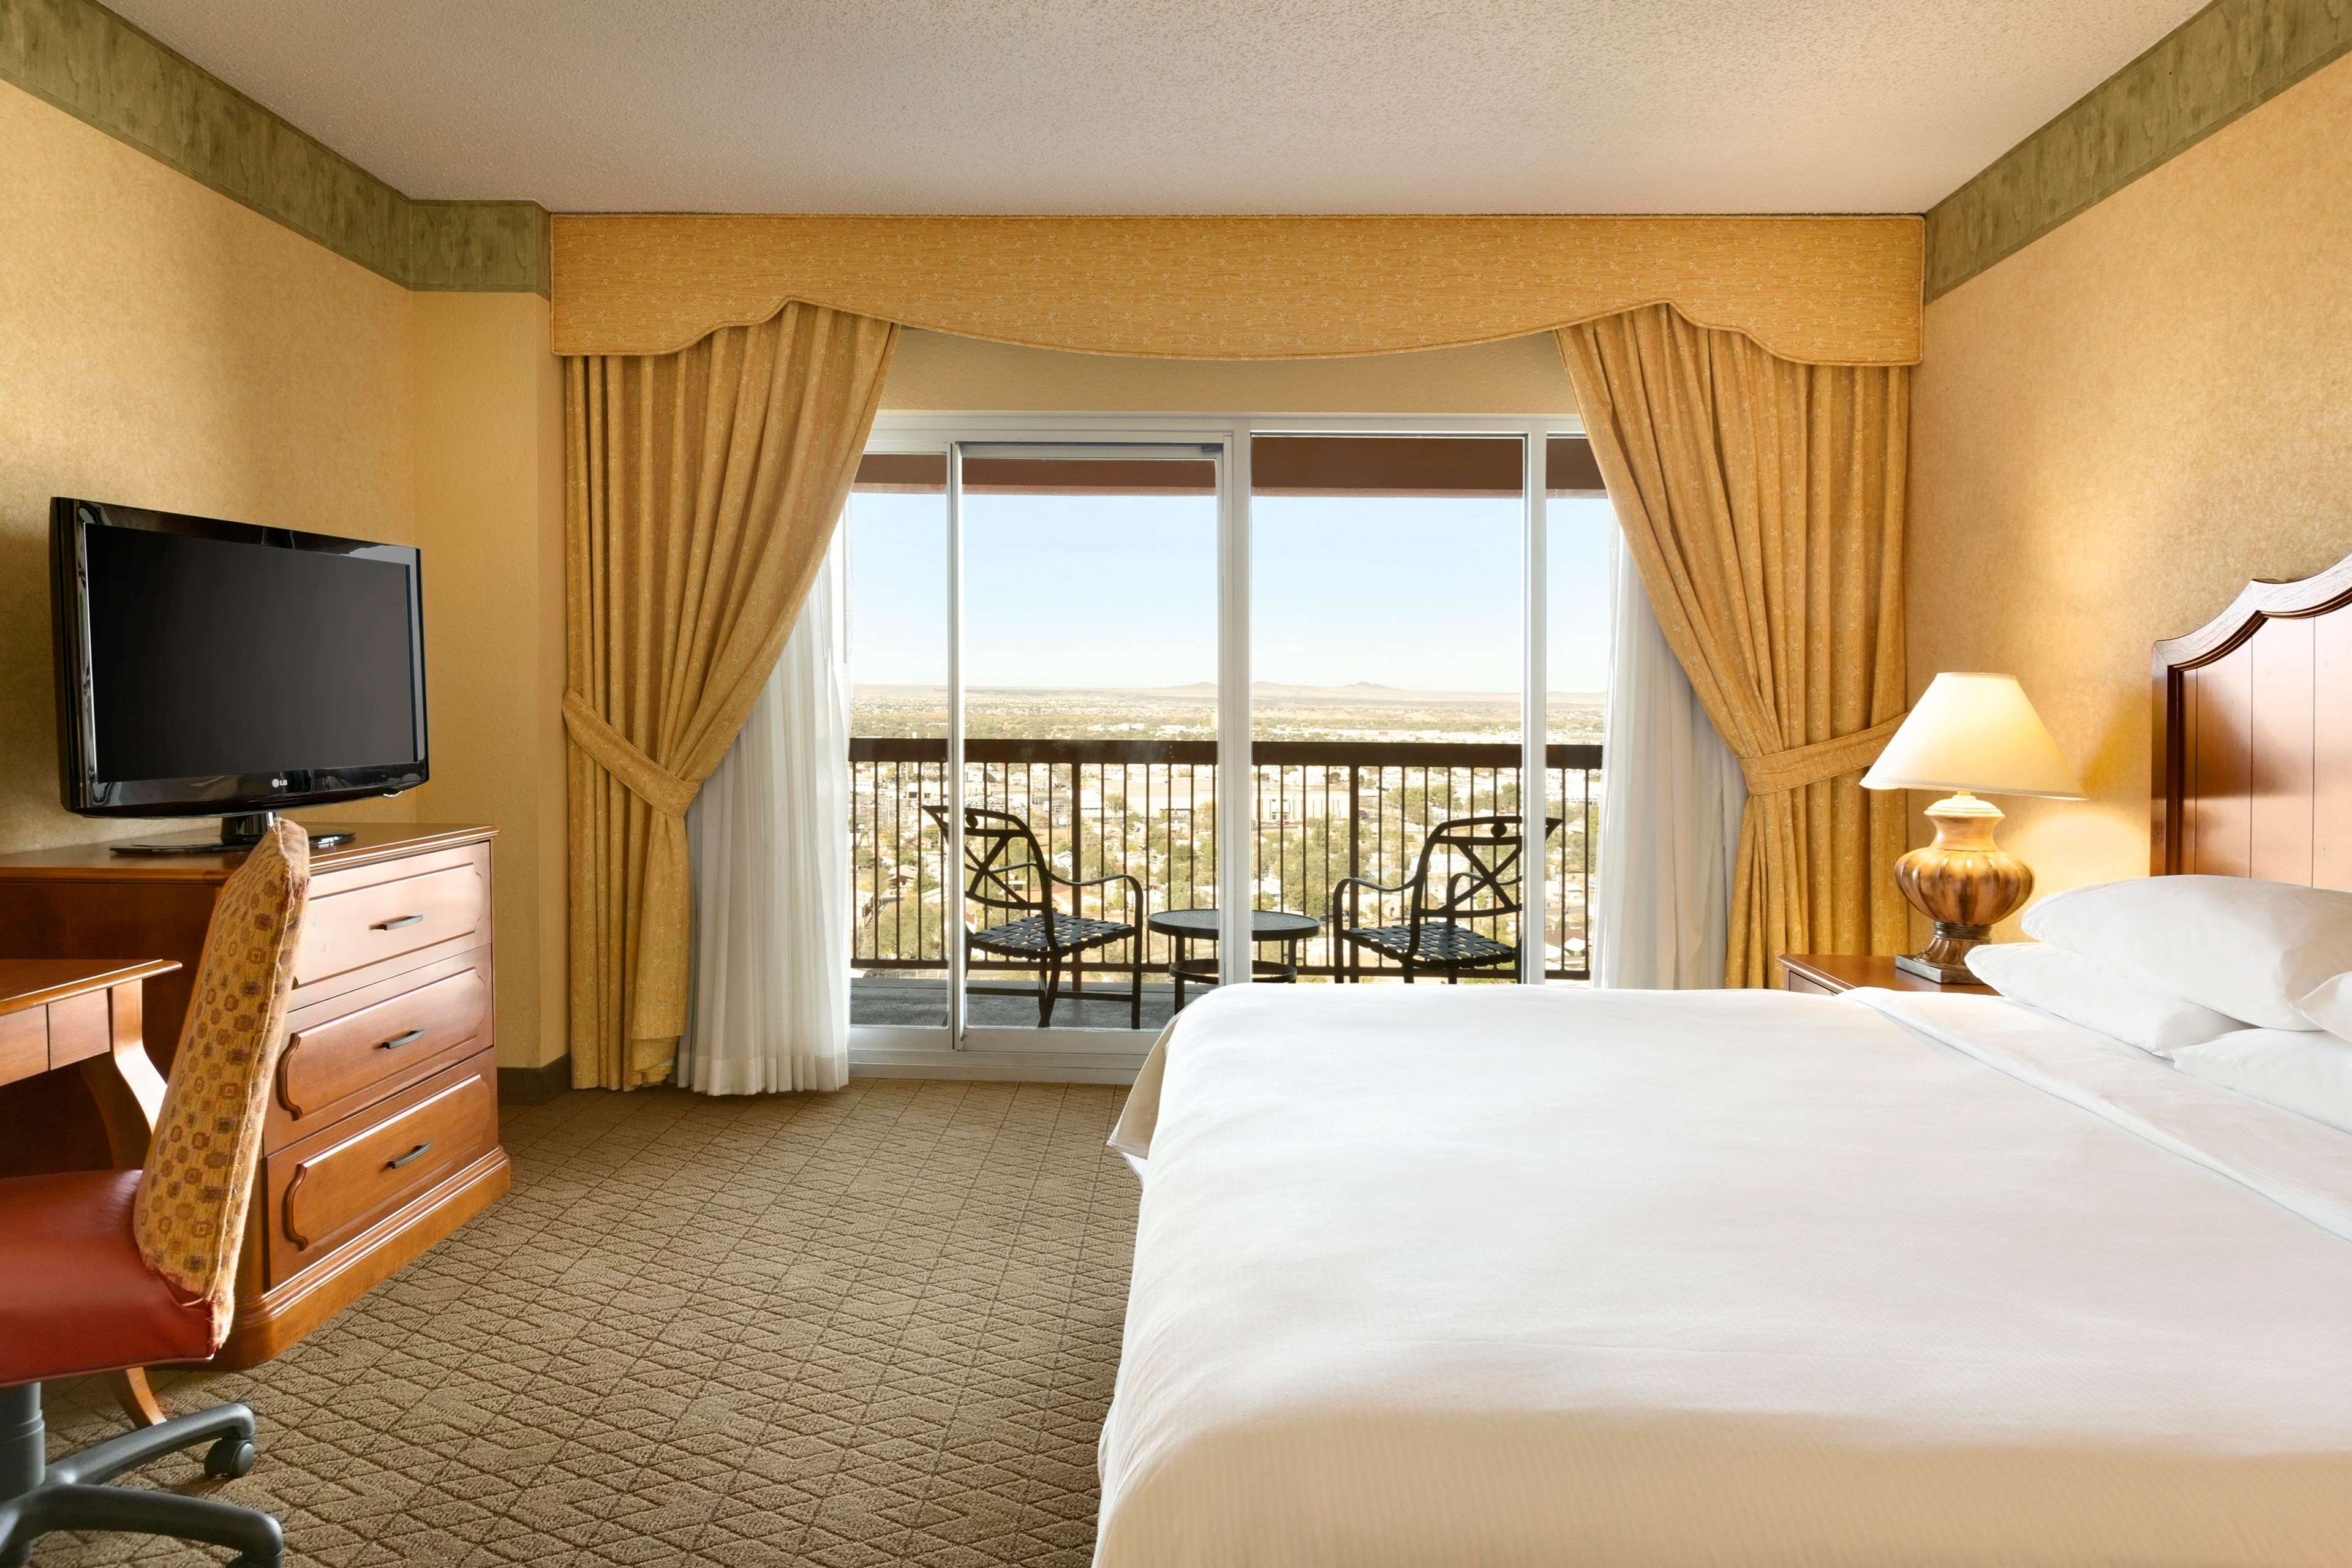 Embassy Suites by Hilton Albuquerque Hotel & Spa image 24